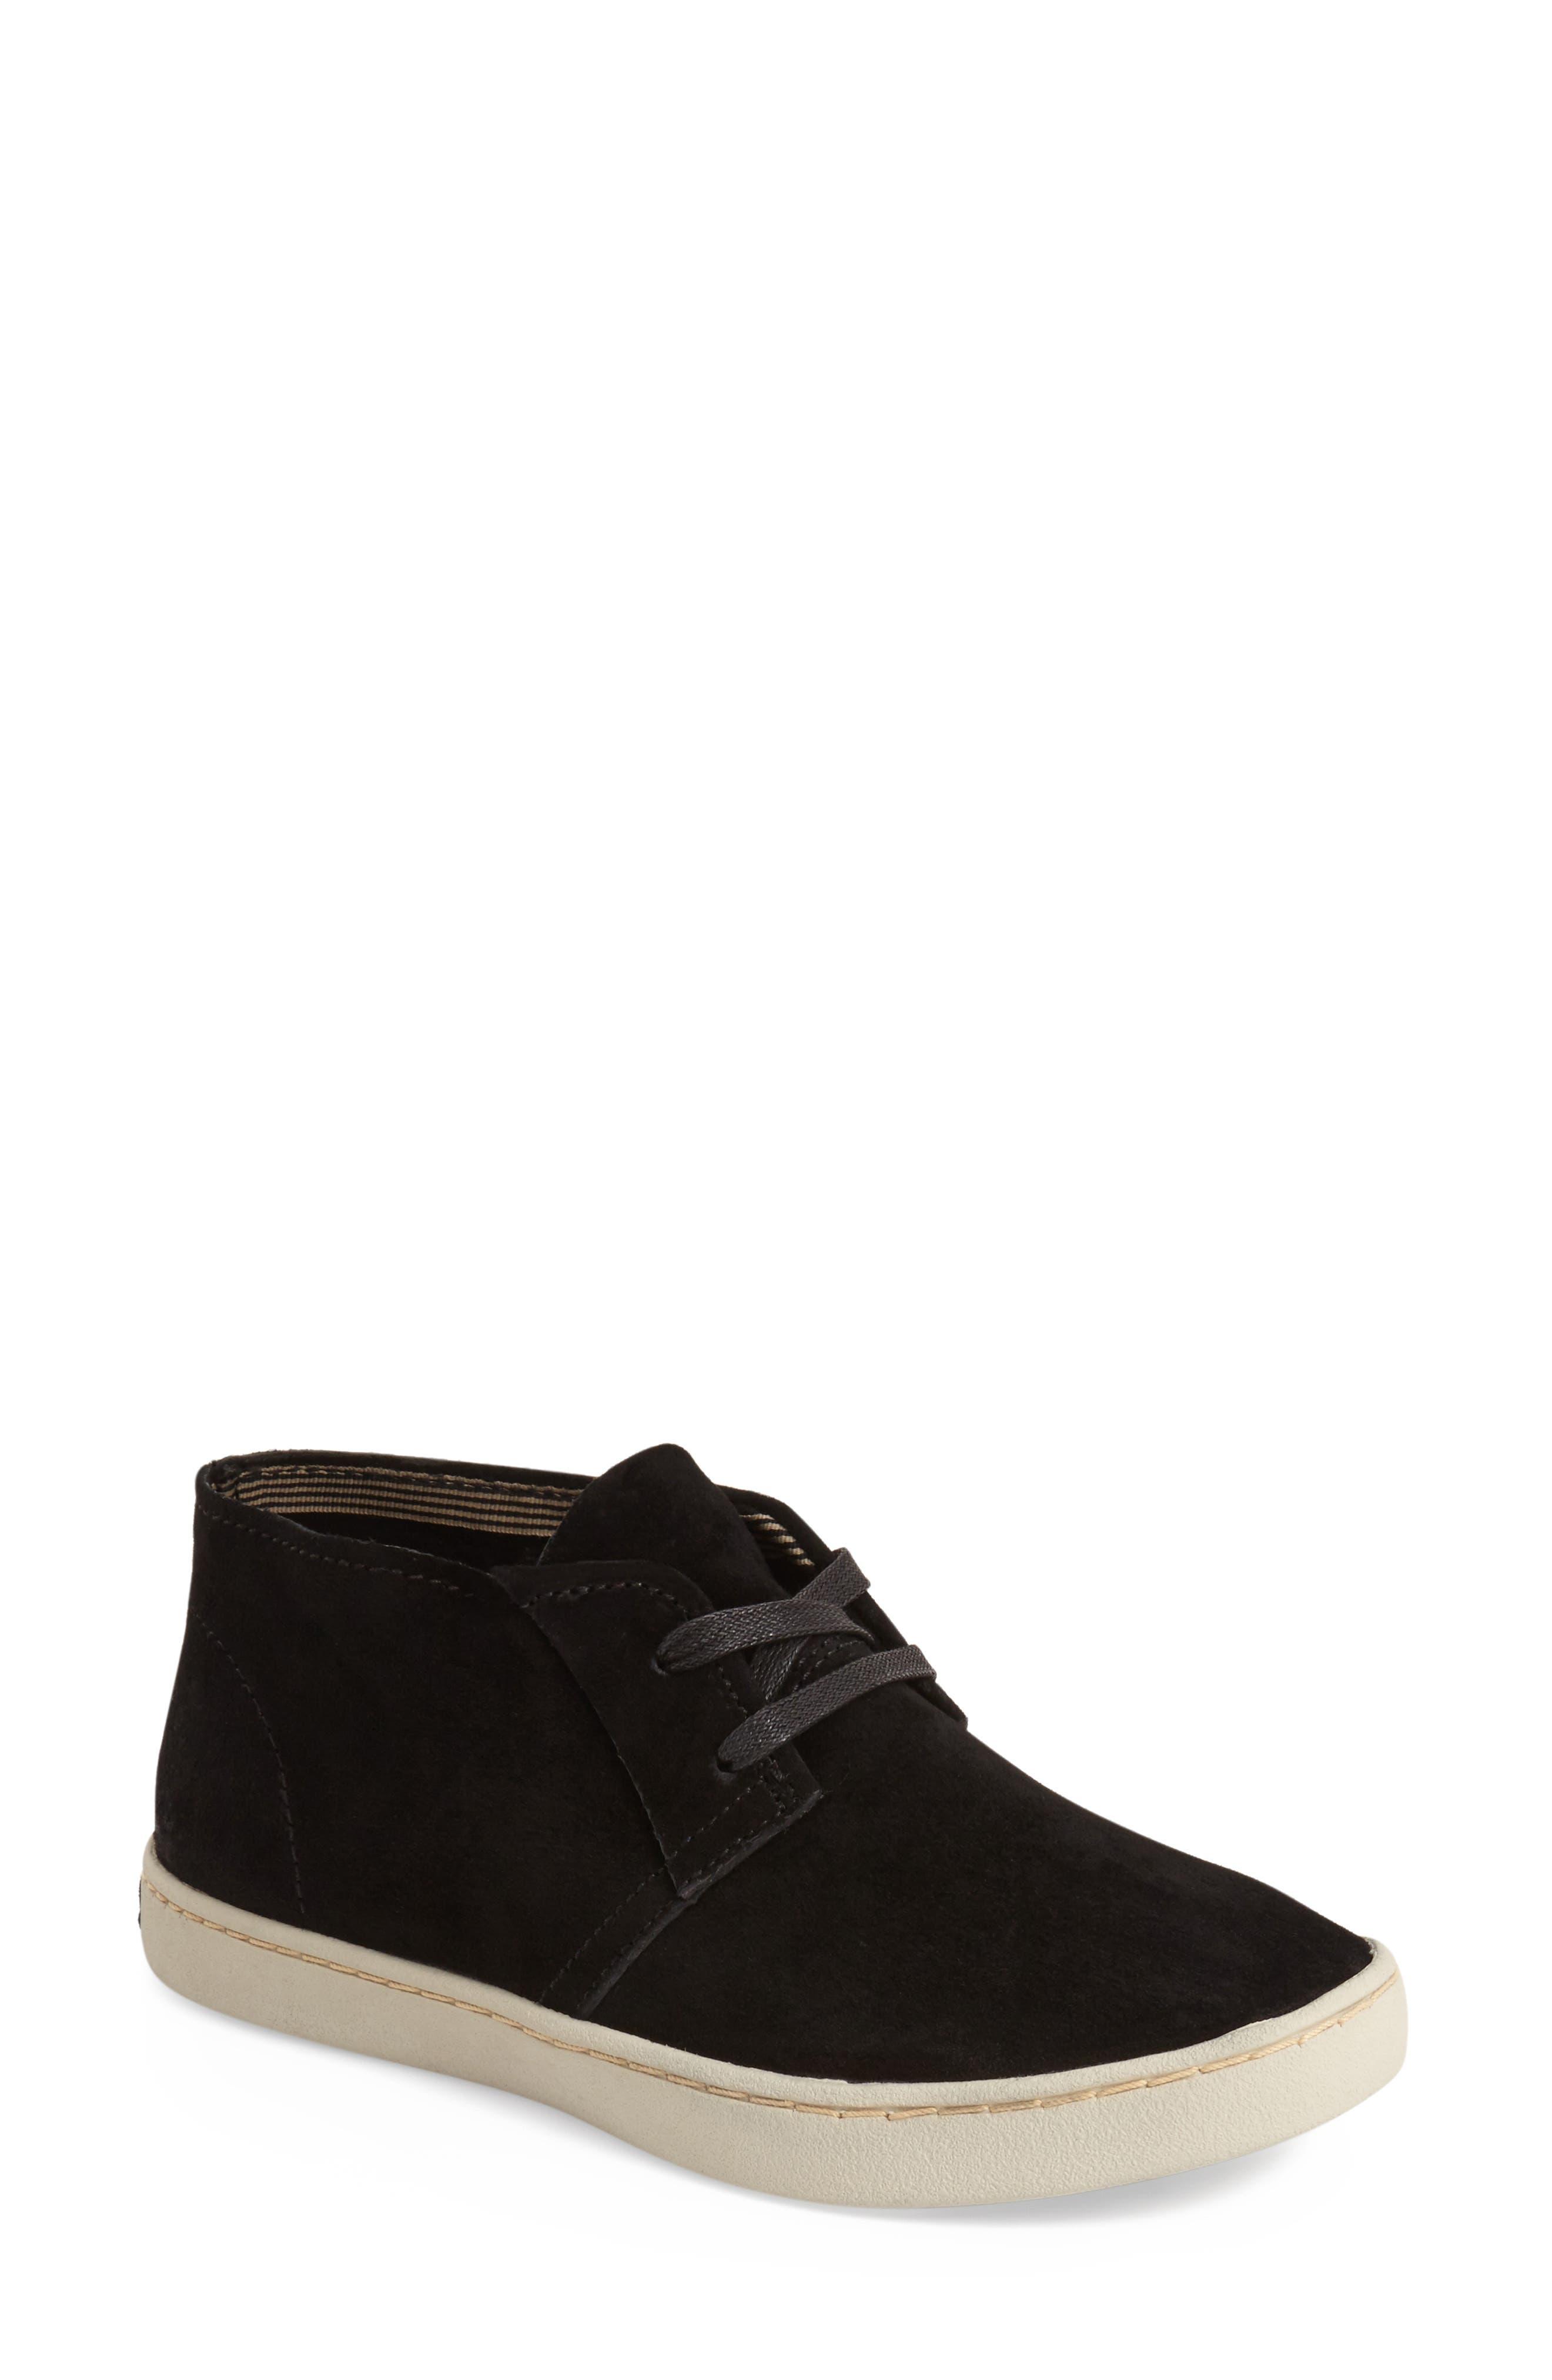 'Cille Gwen' Sneaker,                             Alternate thumbnail 6, color,